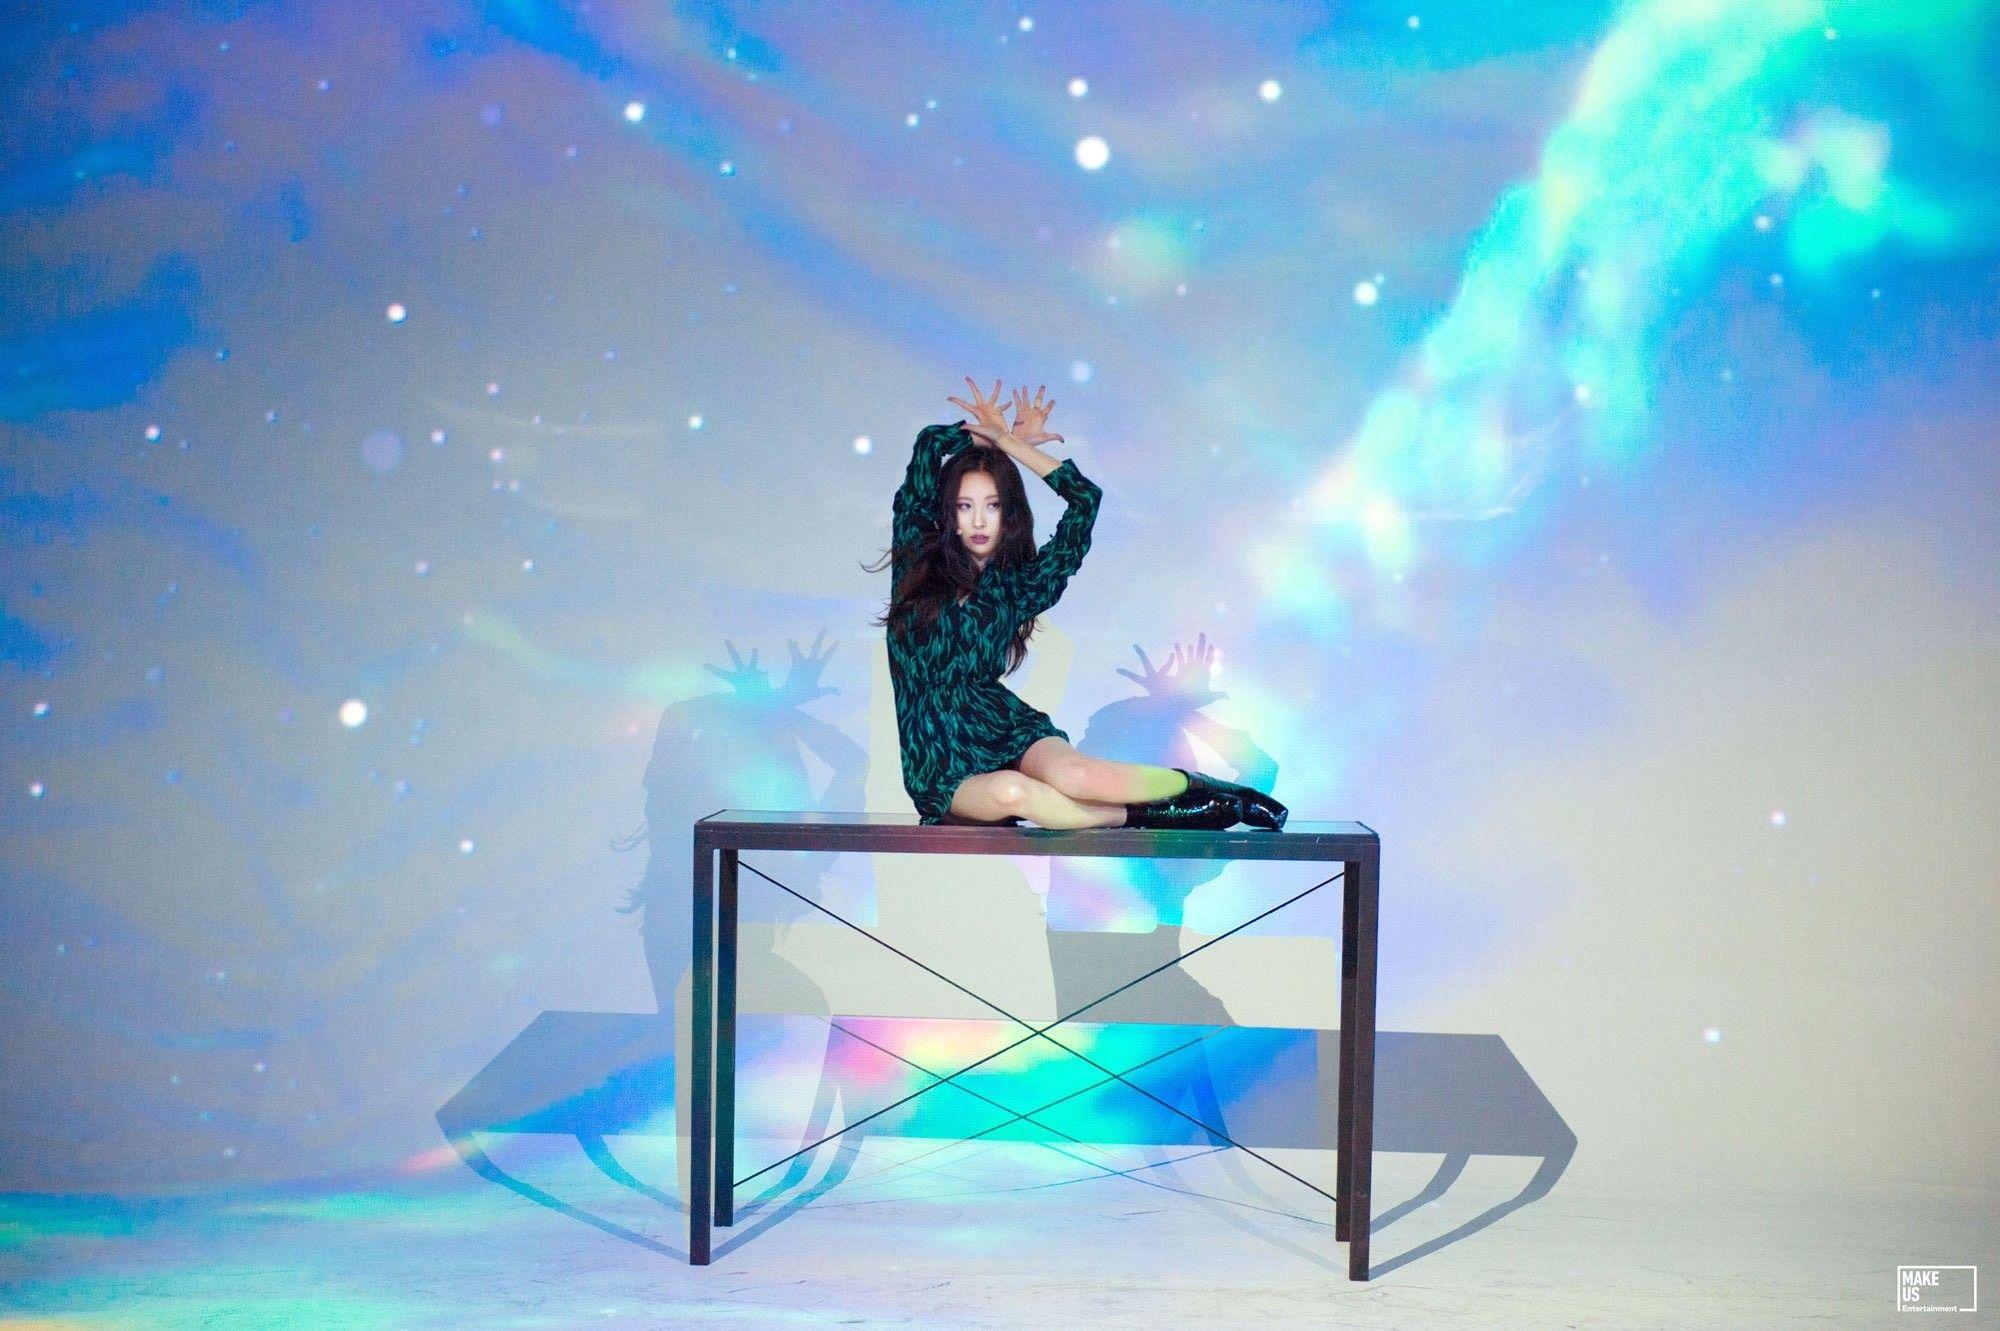 Gashina Kpop Idol